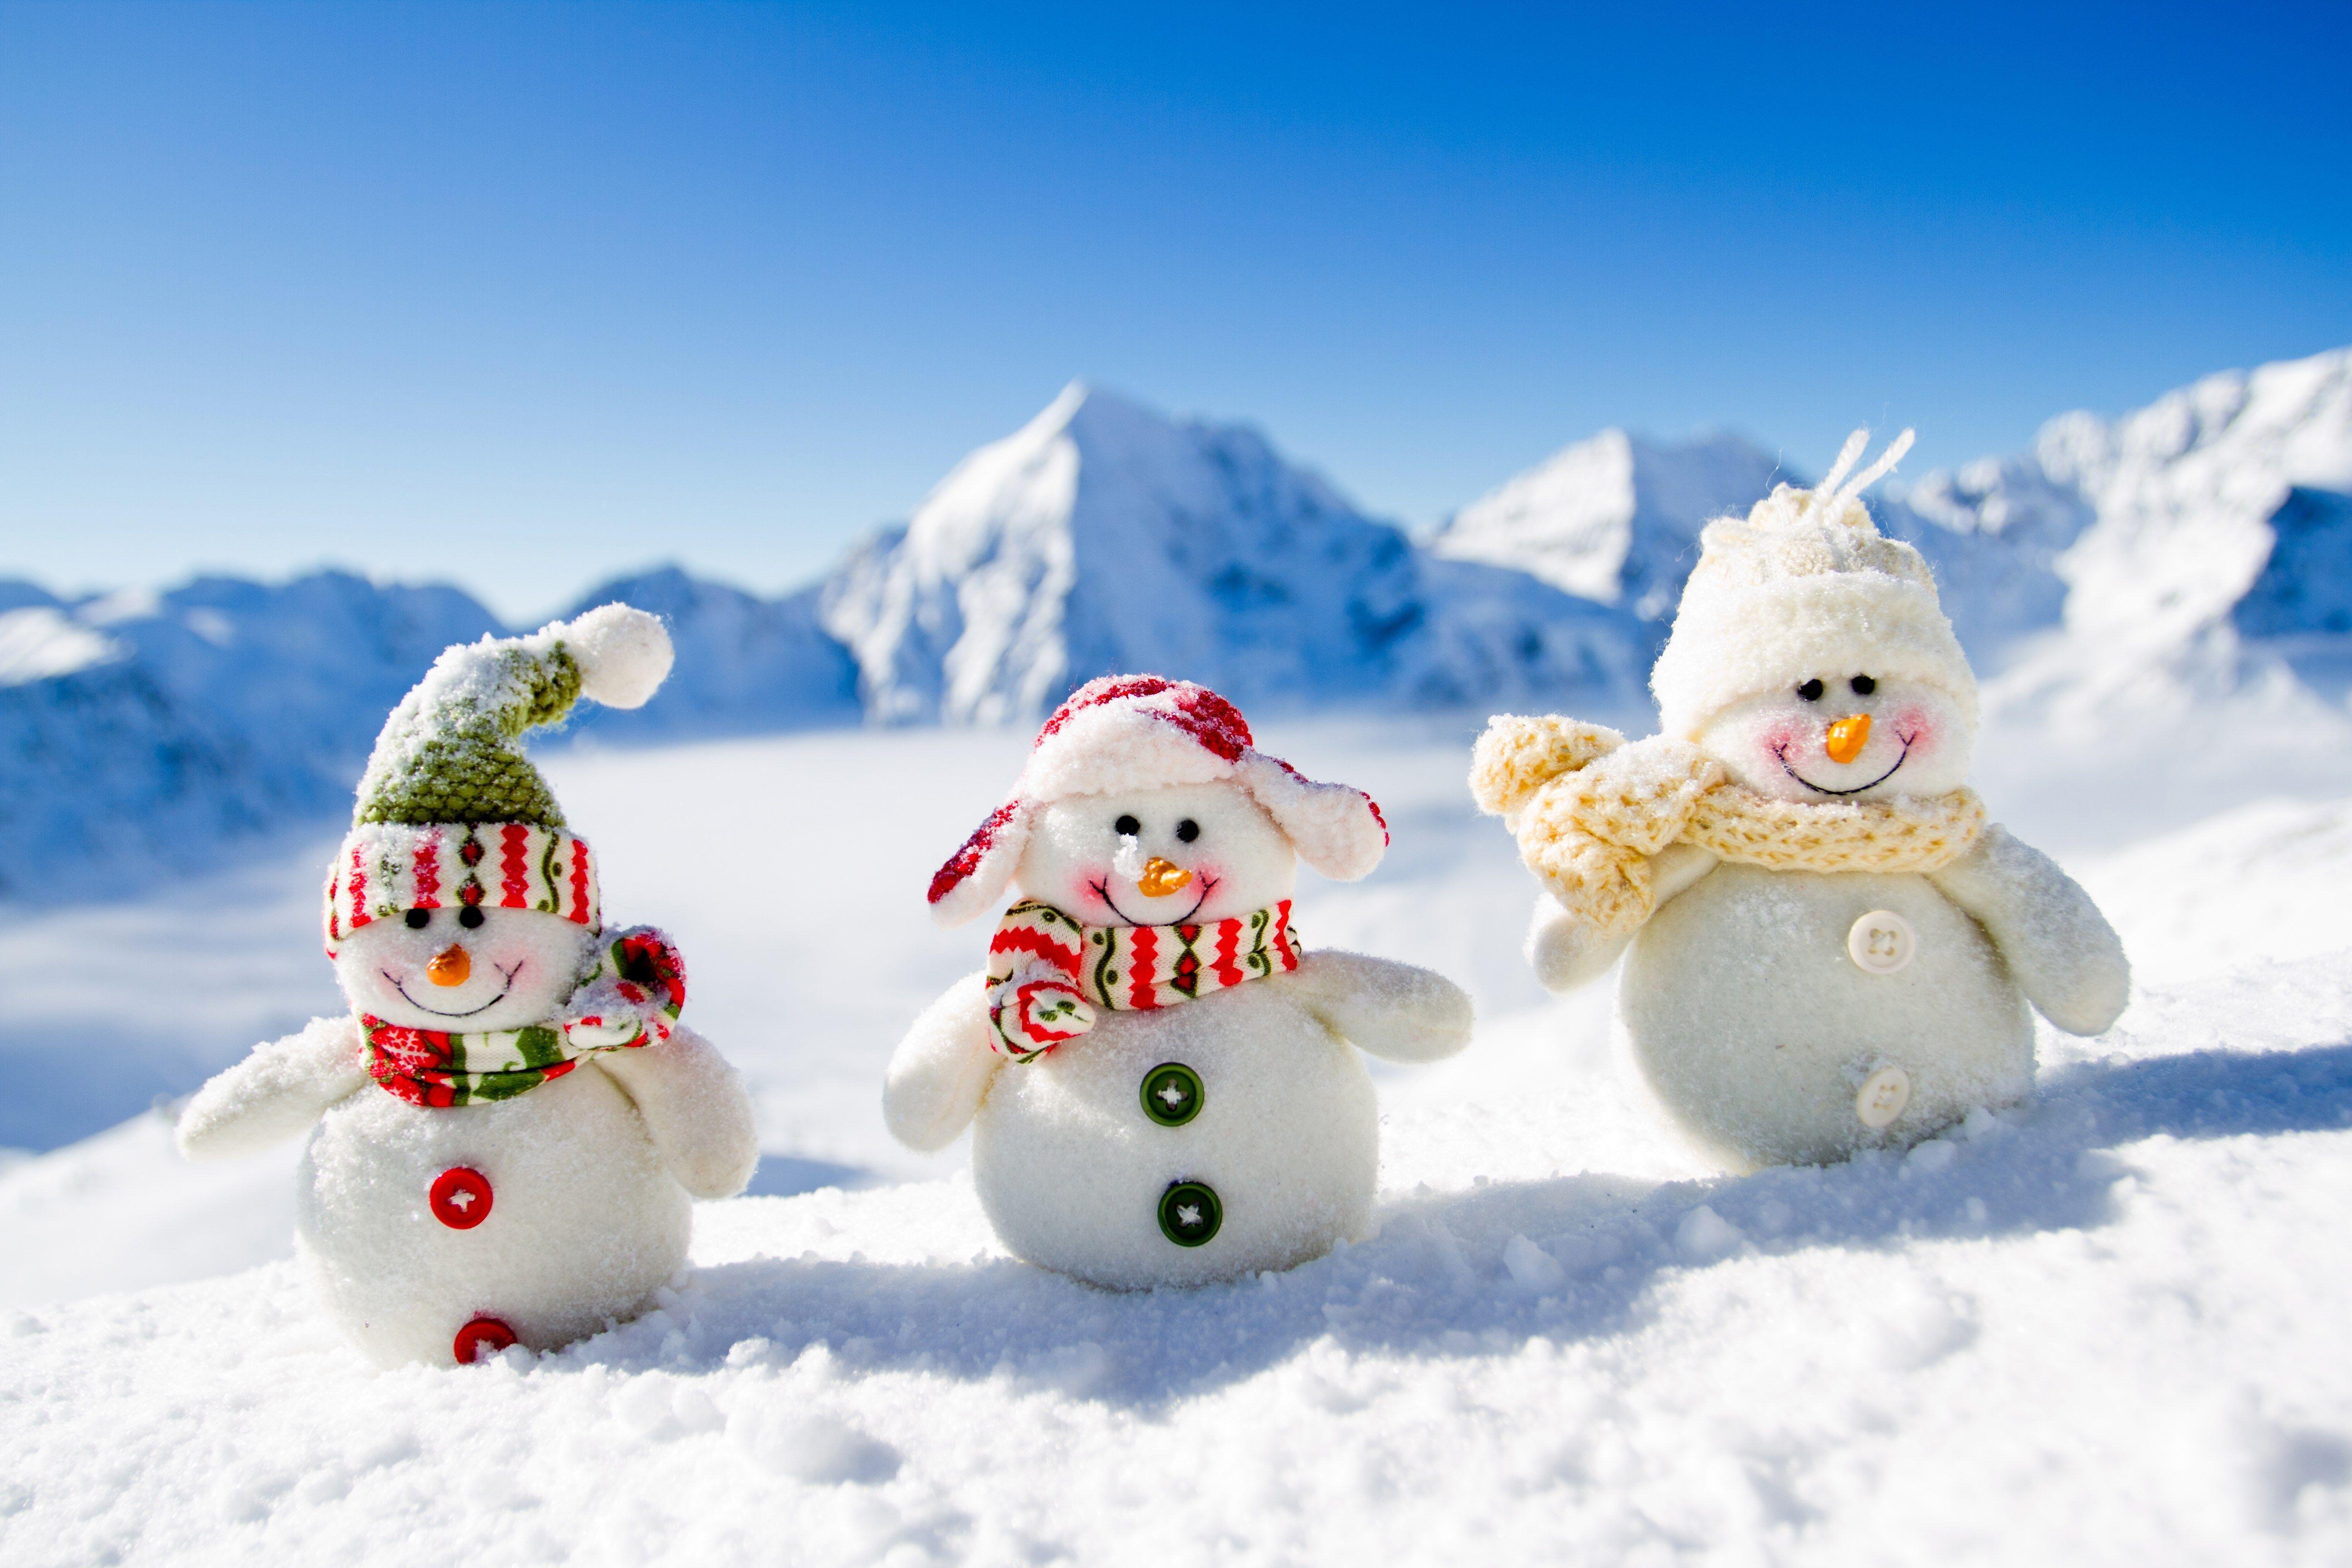 Snowman Desktop Wallpapers Top Free Snowman Desktop